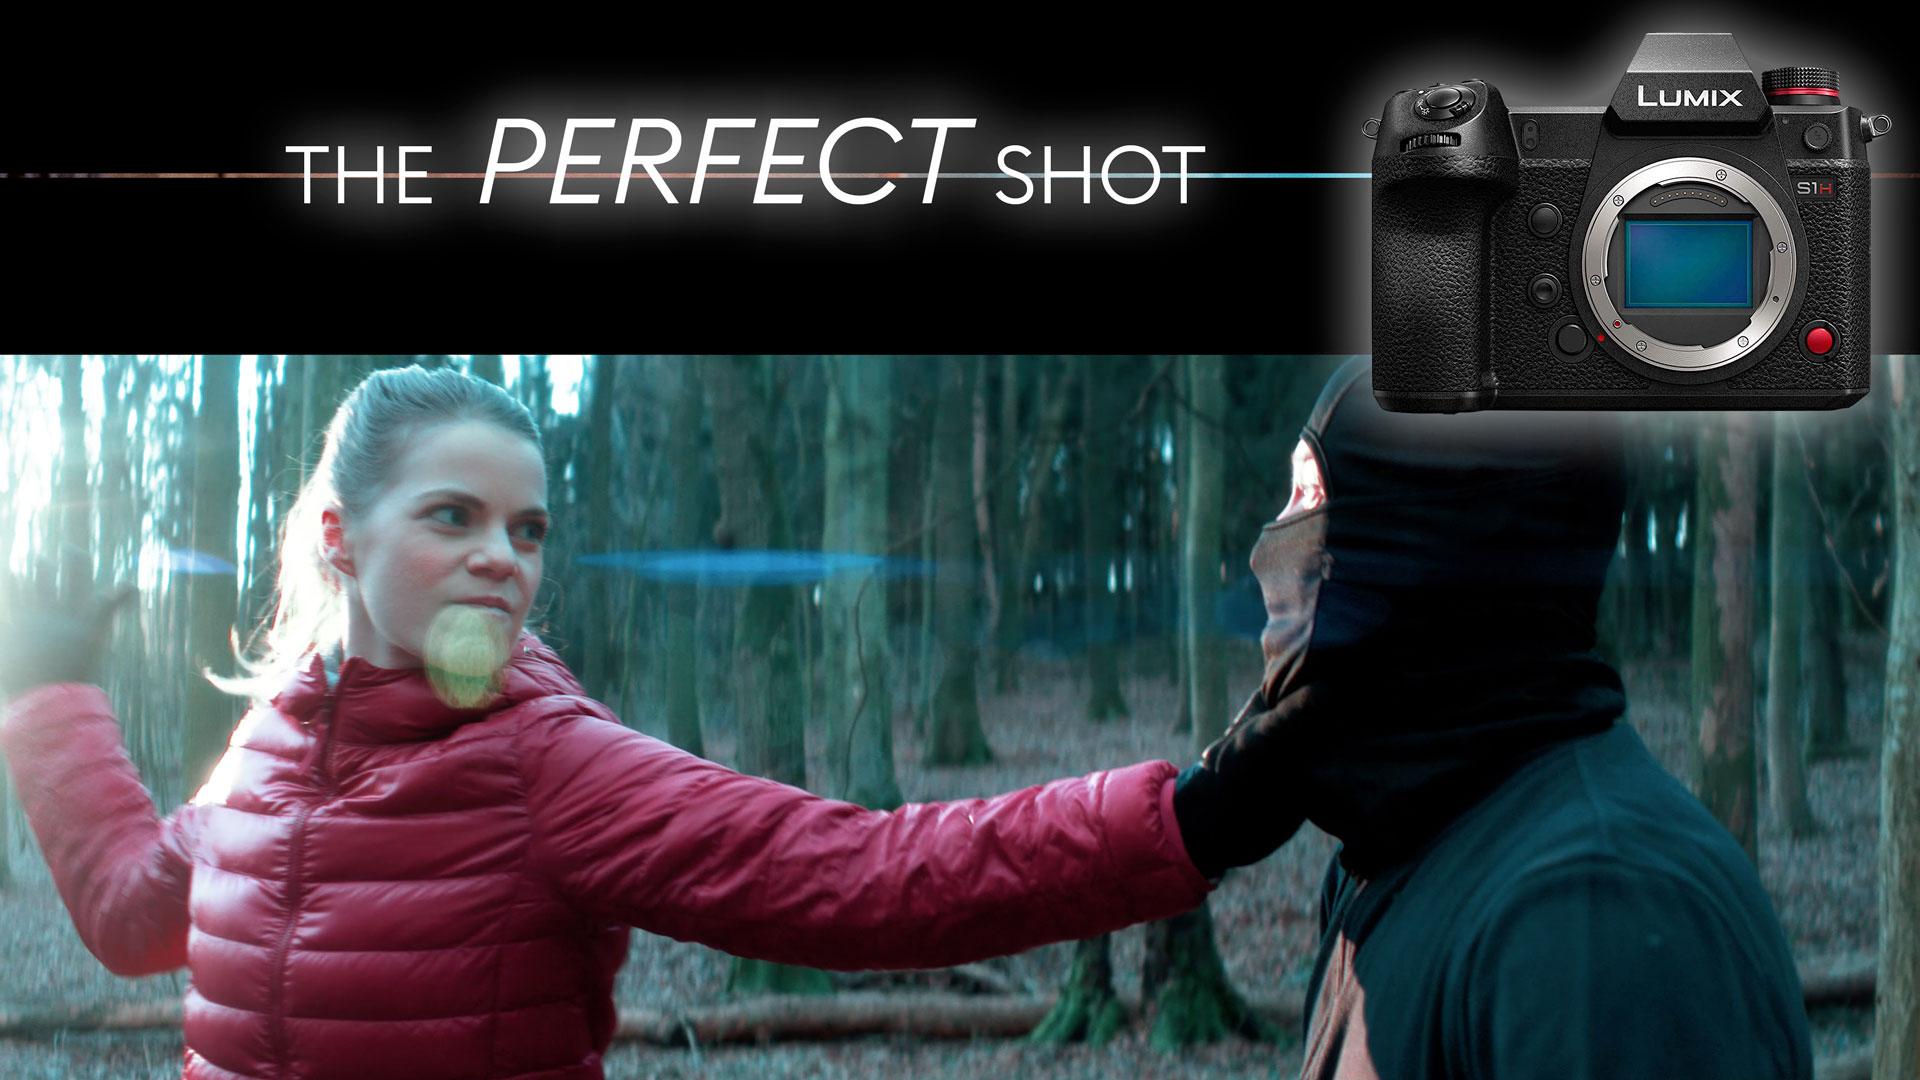 The PERFECT Shot - パナソニックのカメラ機能を解説